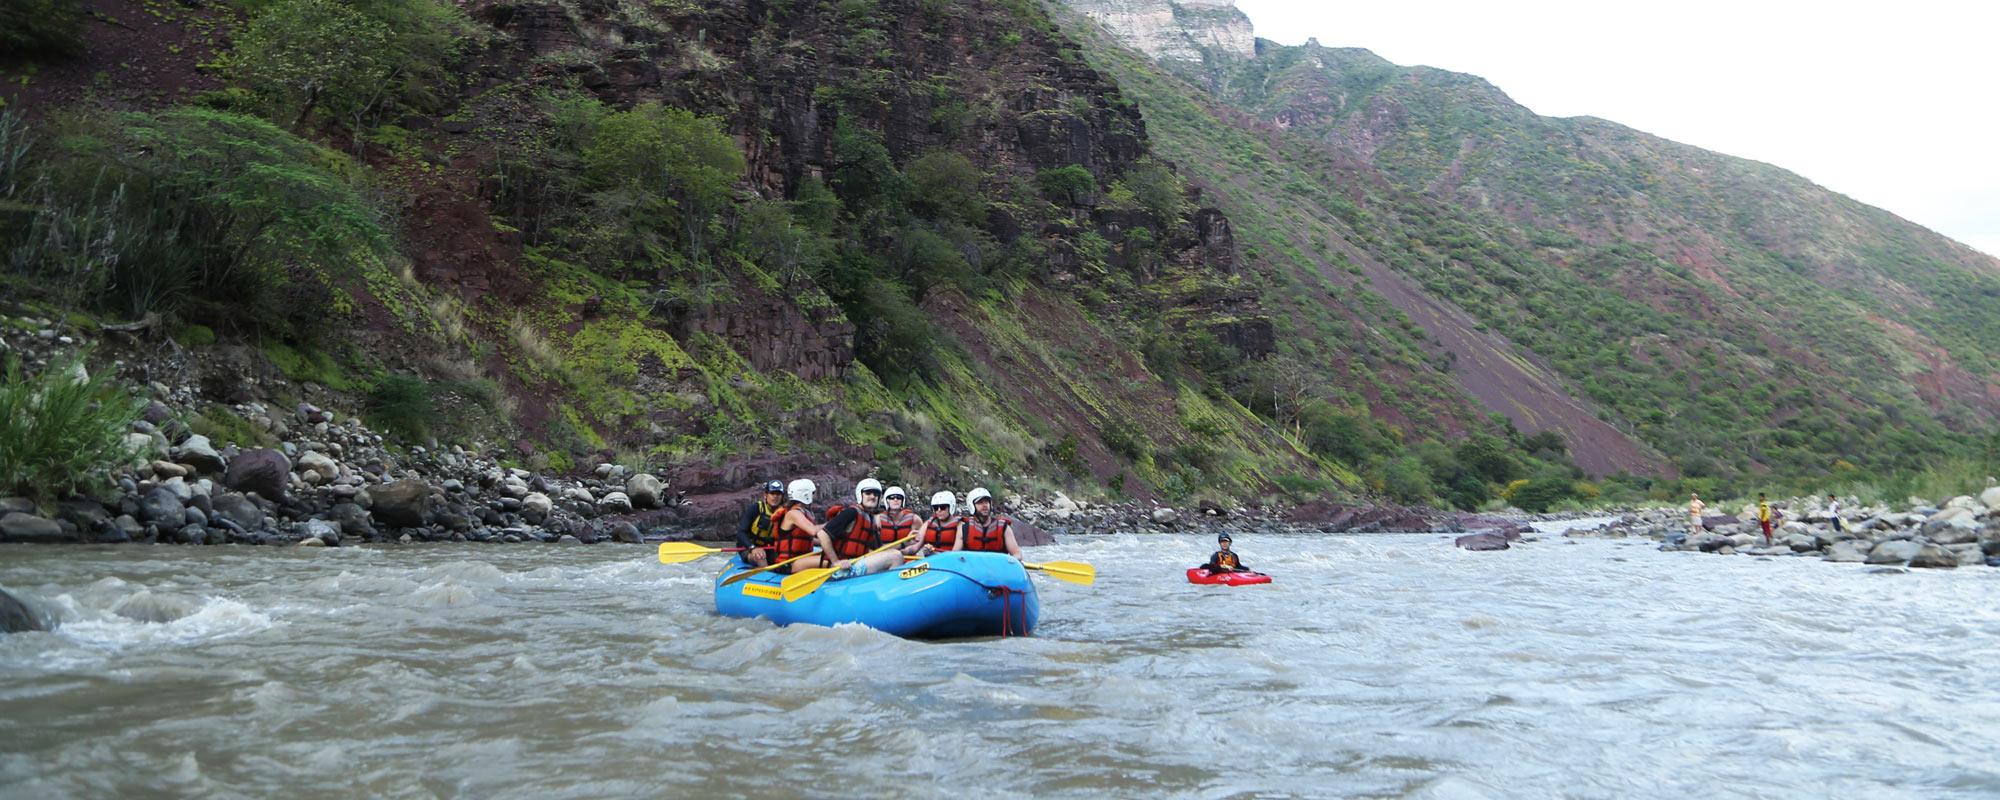 santander-rafting-002 Santander Rafting